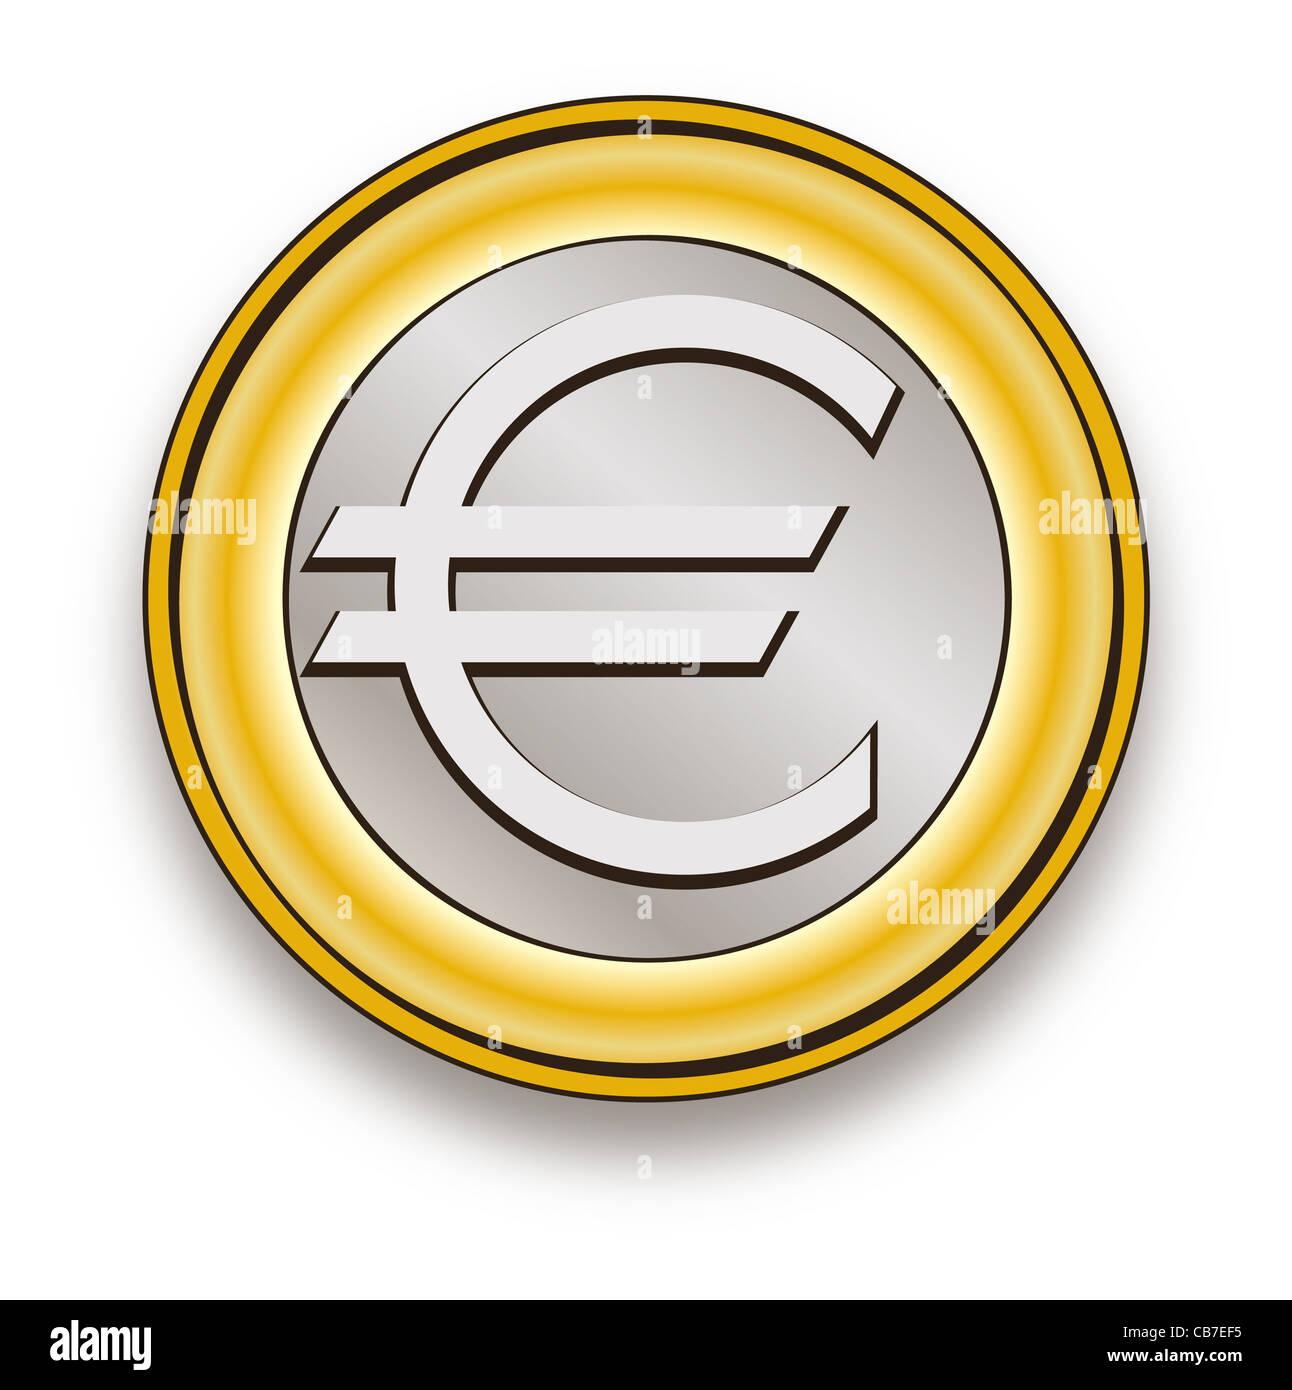 The Greek Crisis